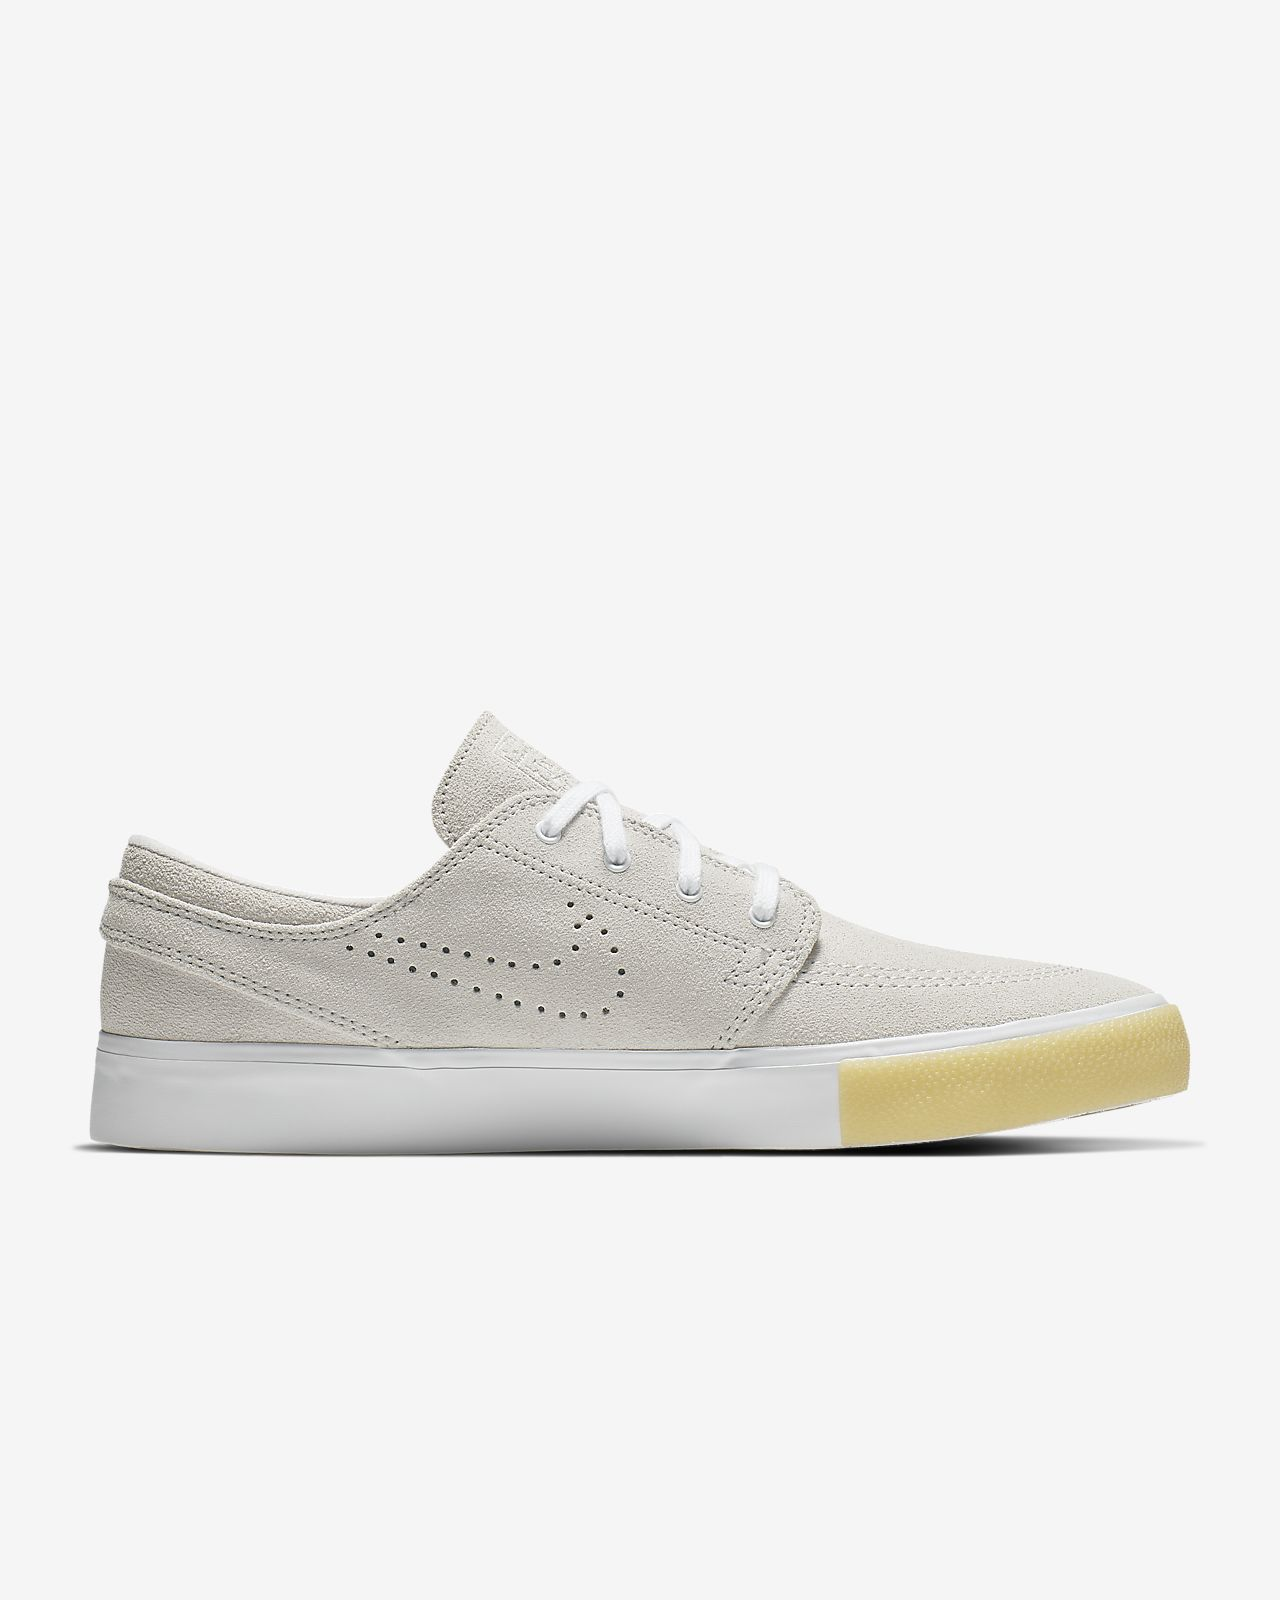 super popular 9c166 a29cc ... Nike SB Zoom Stefan Janoski RM SE Skate Shoe